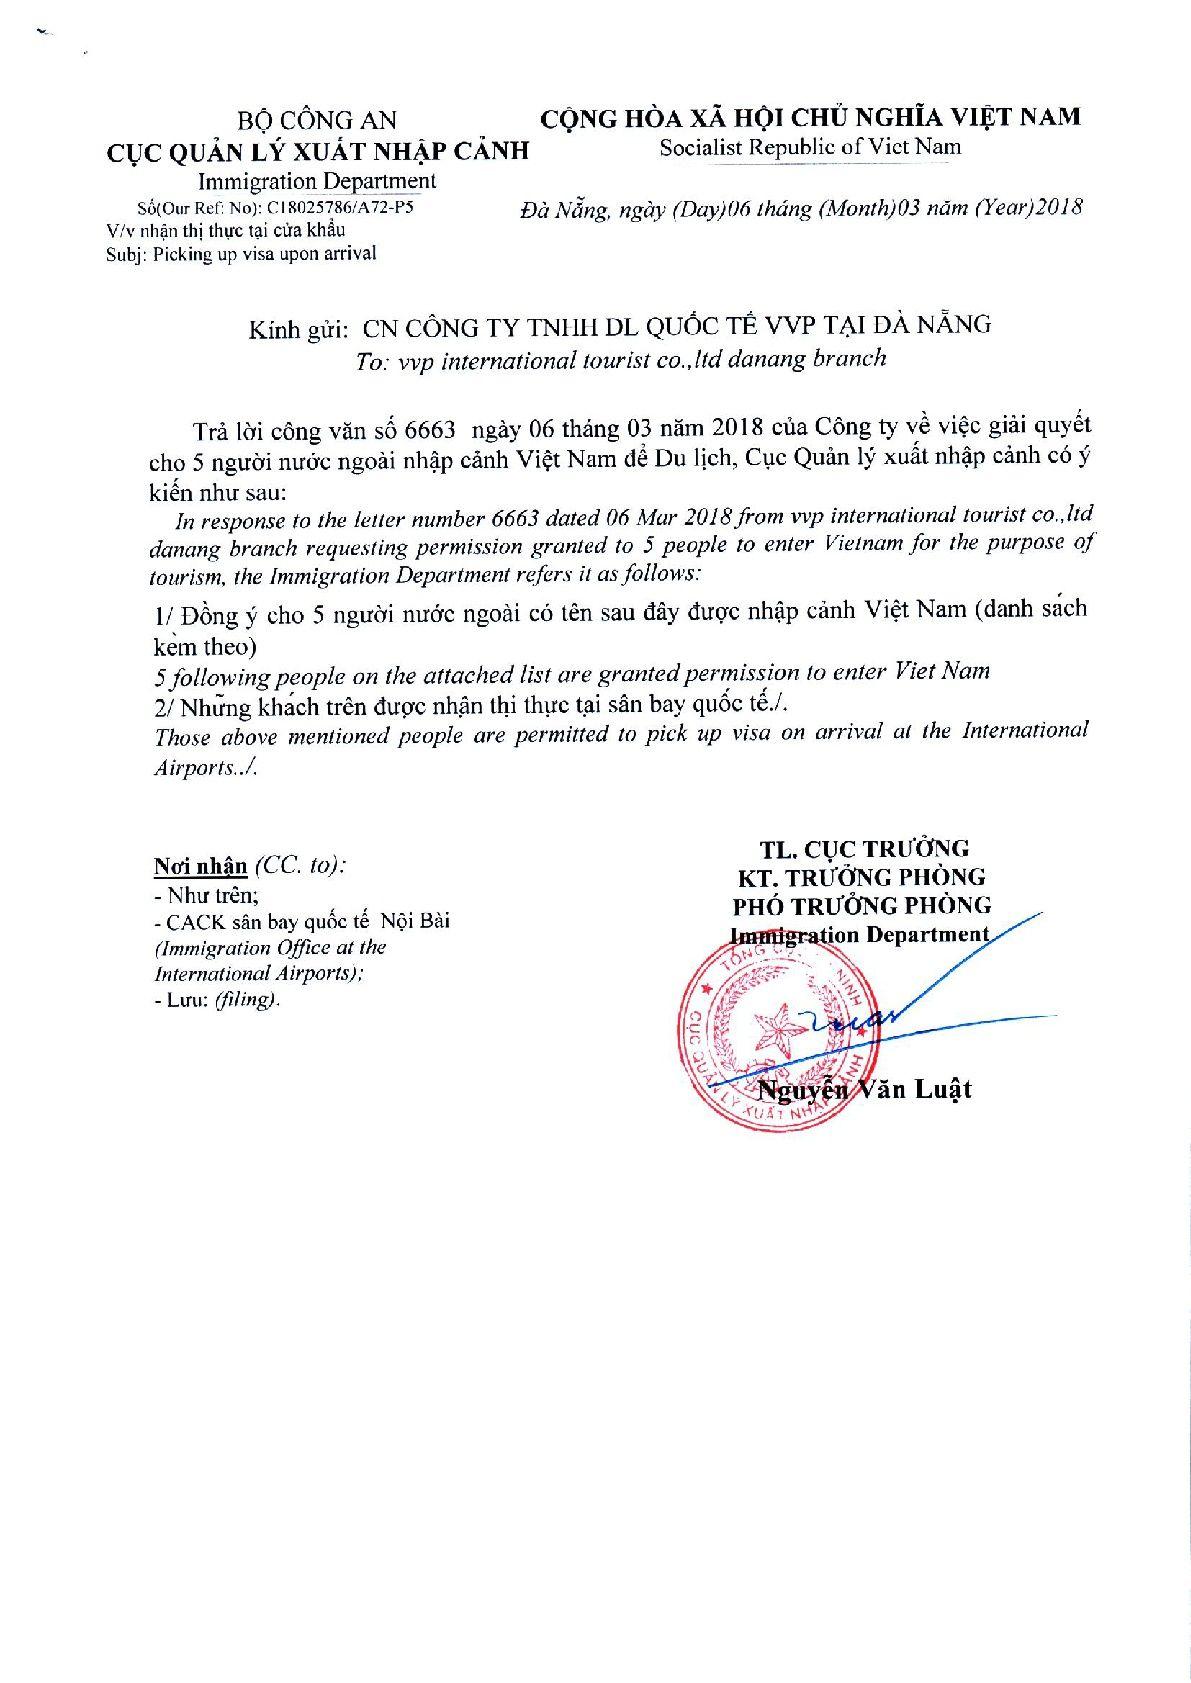 pin on vietnam visa arrival harvard law resume template internship free download format for digital marketing executive